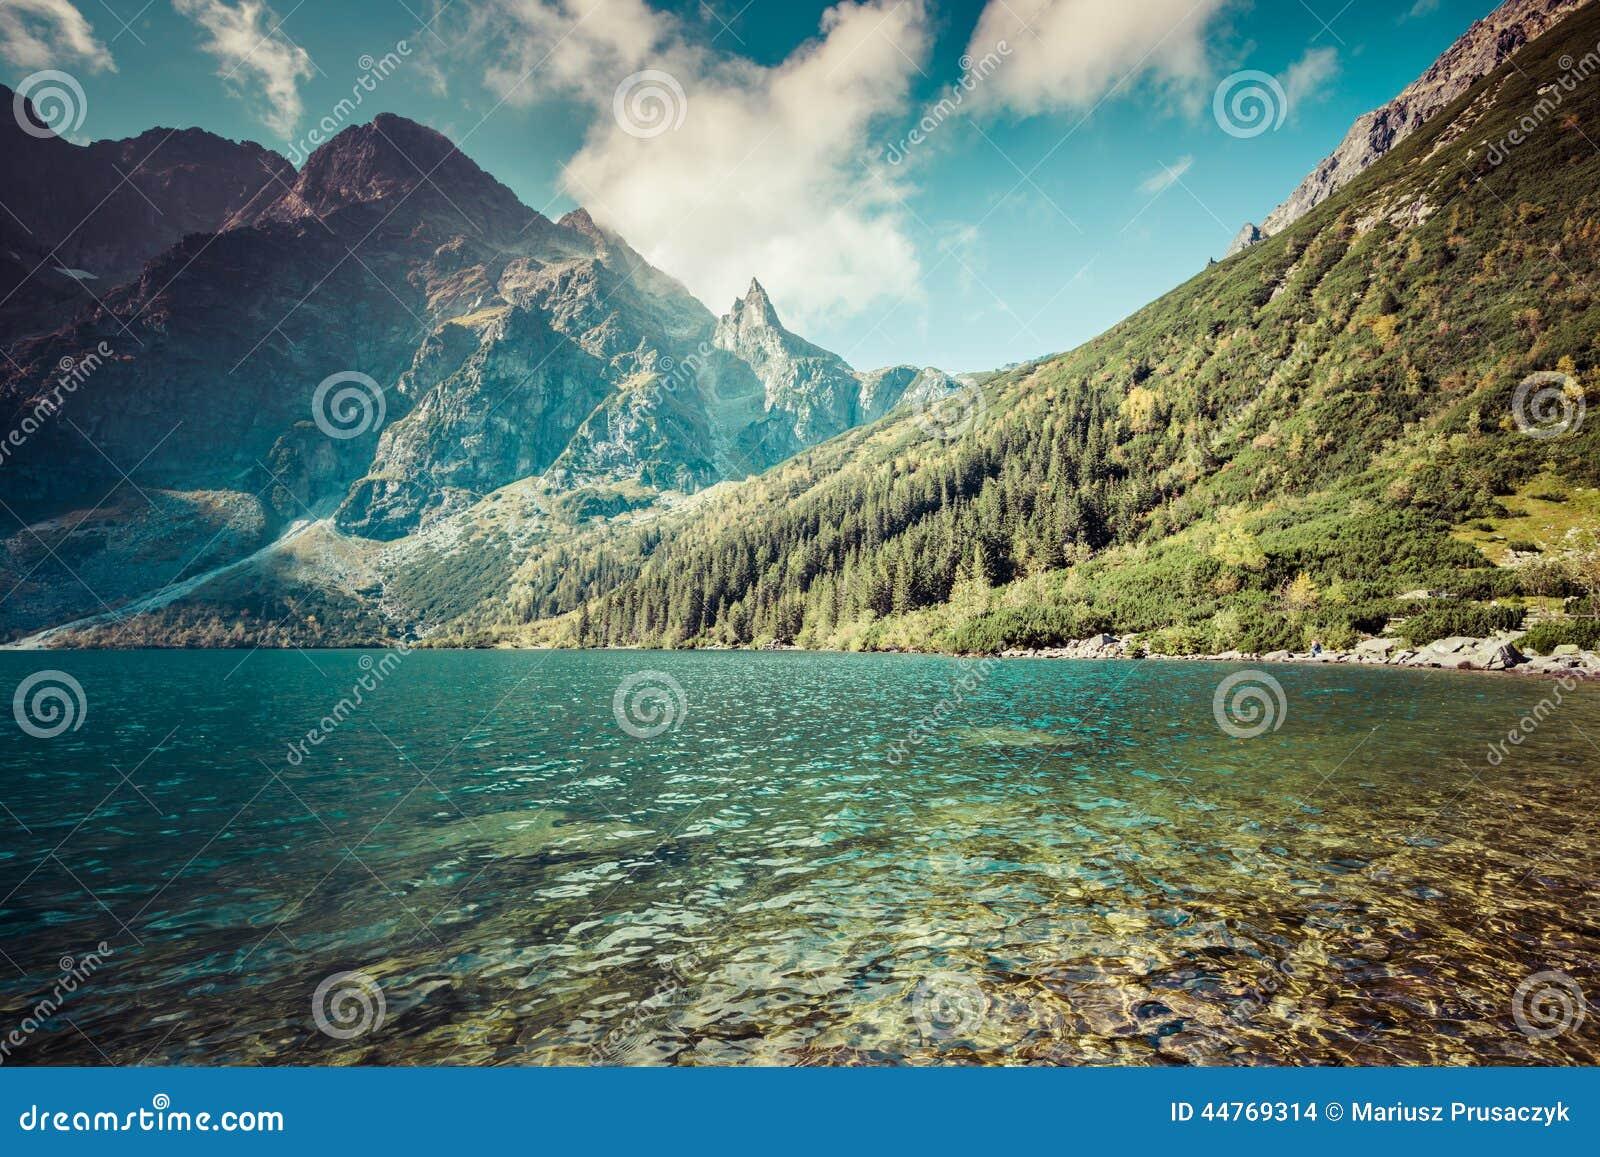 Grüner Wassergebirgssee Morskie Oko, Tatra-Berge, Polen